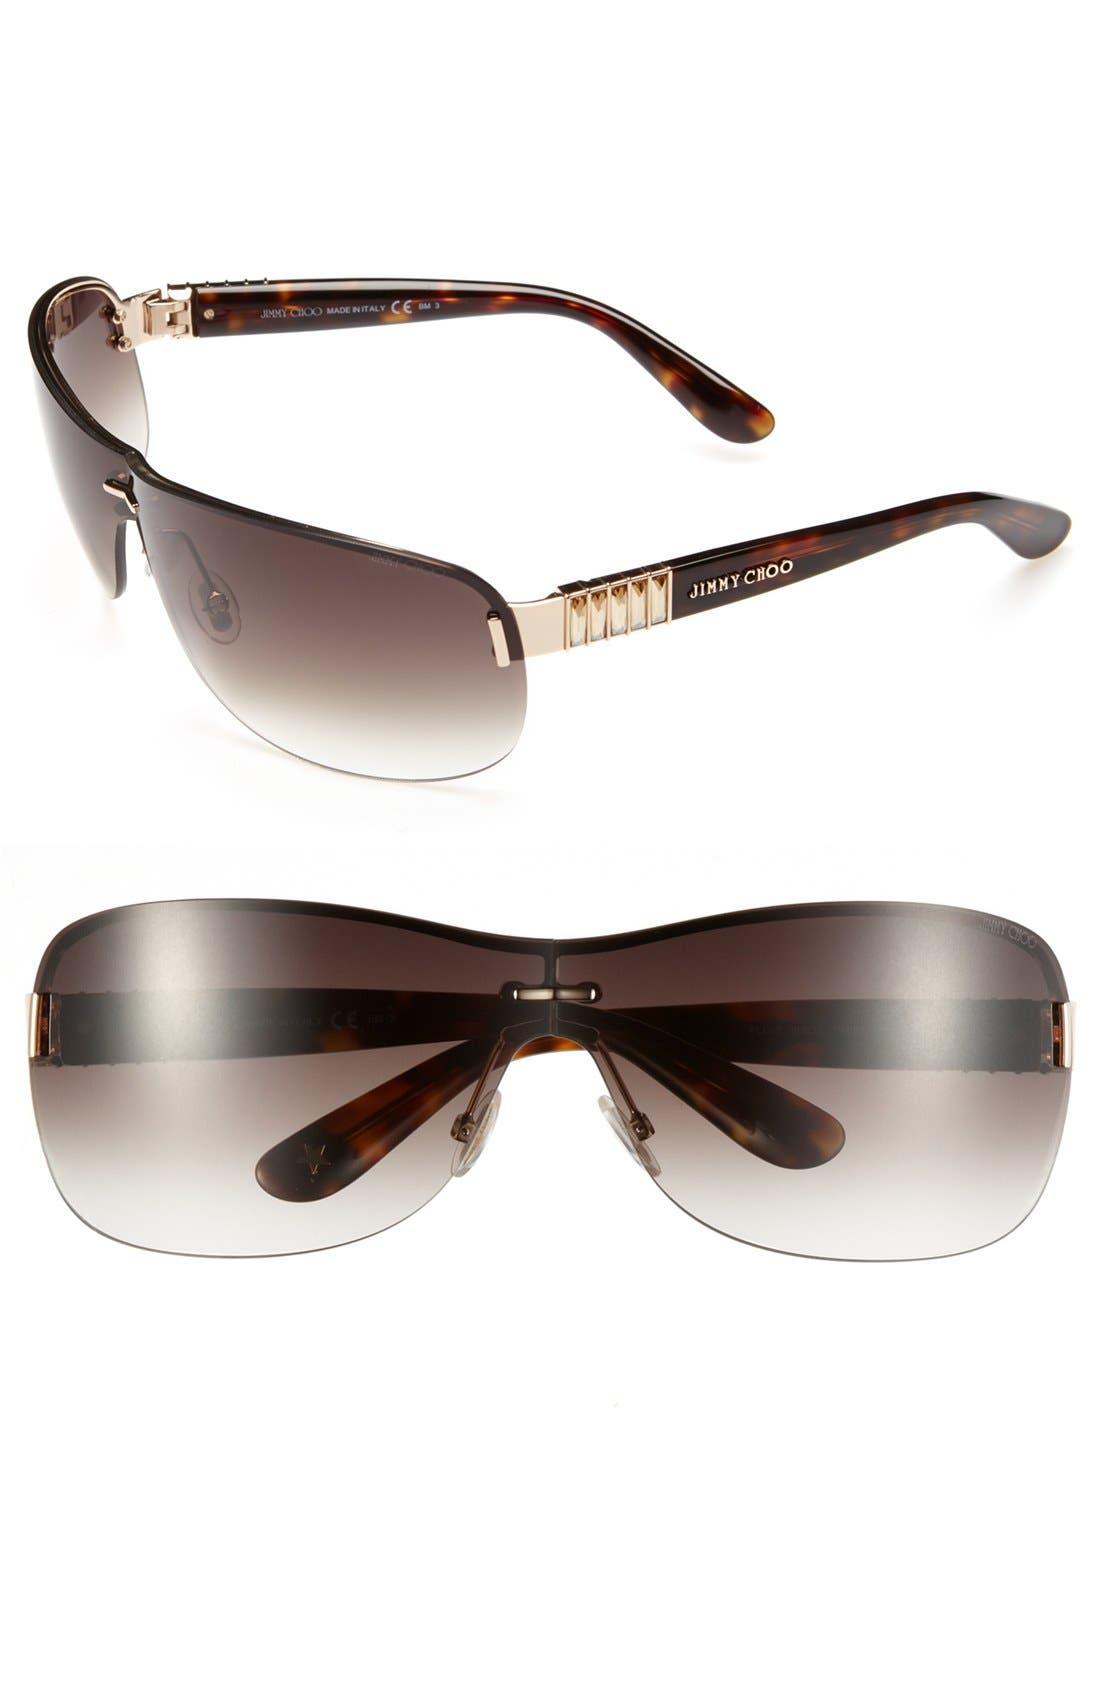 Main Image - Jimmy Choo 'Flo' 76mm Sunglasses